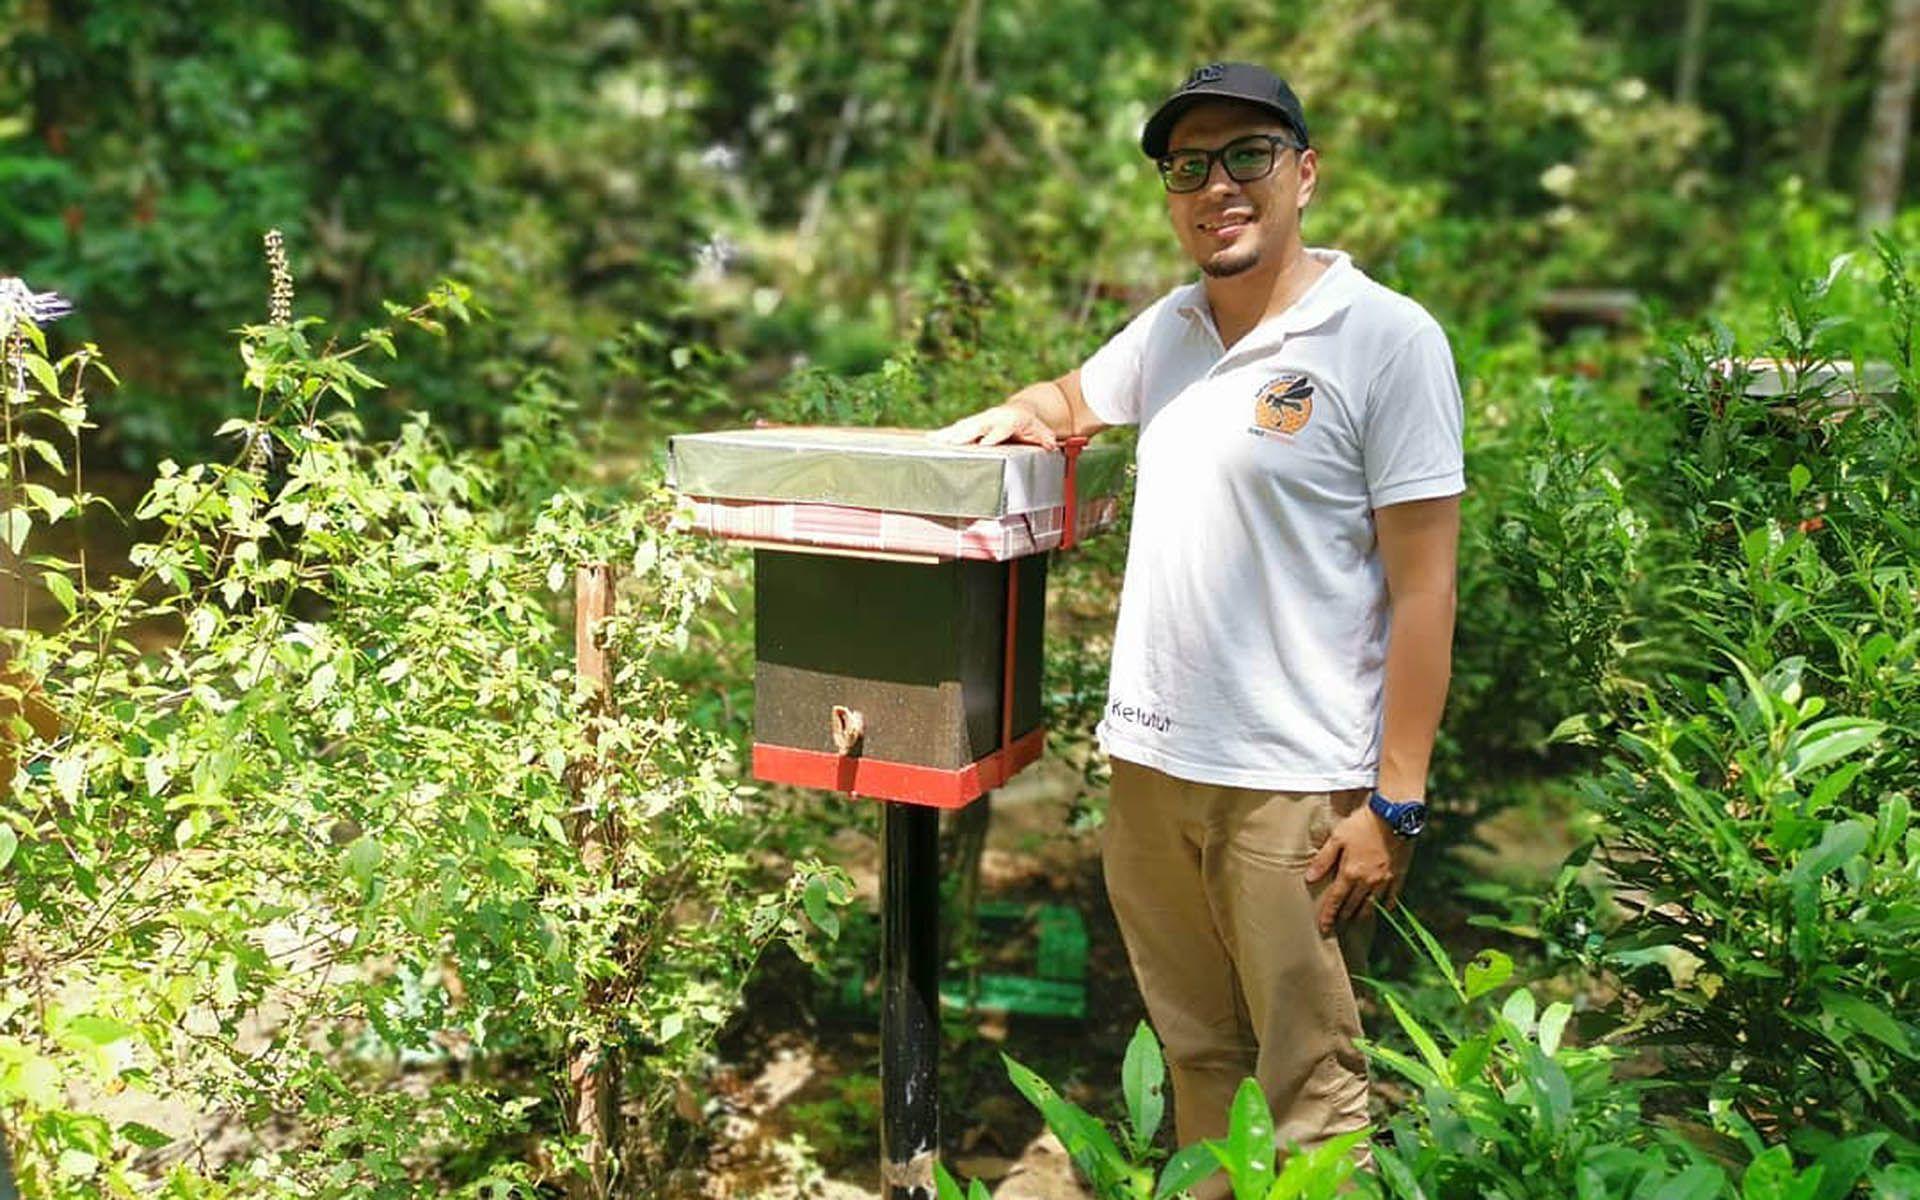 Azril Dino, head beekeeper & founder of Dino's Kelutut Stingless Bee Honey.